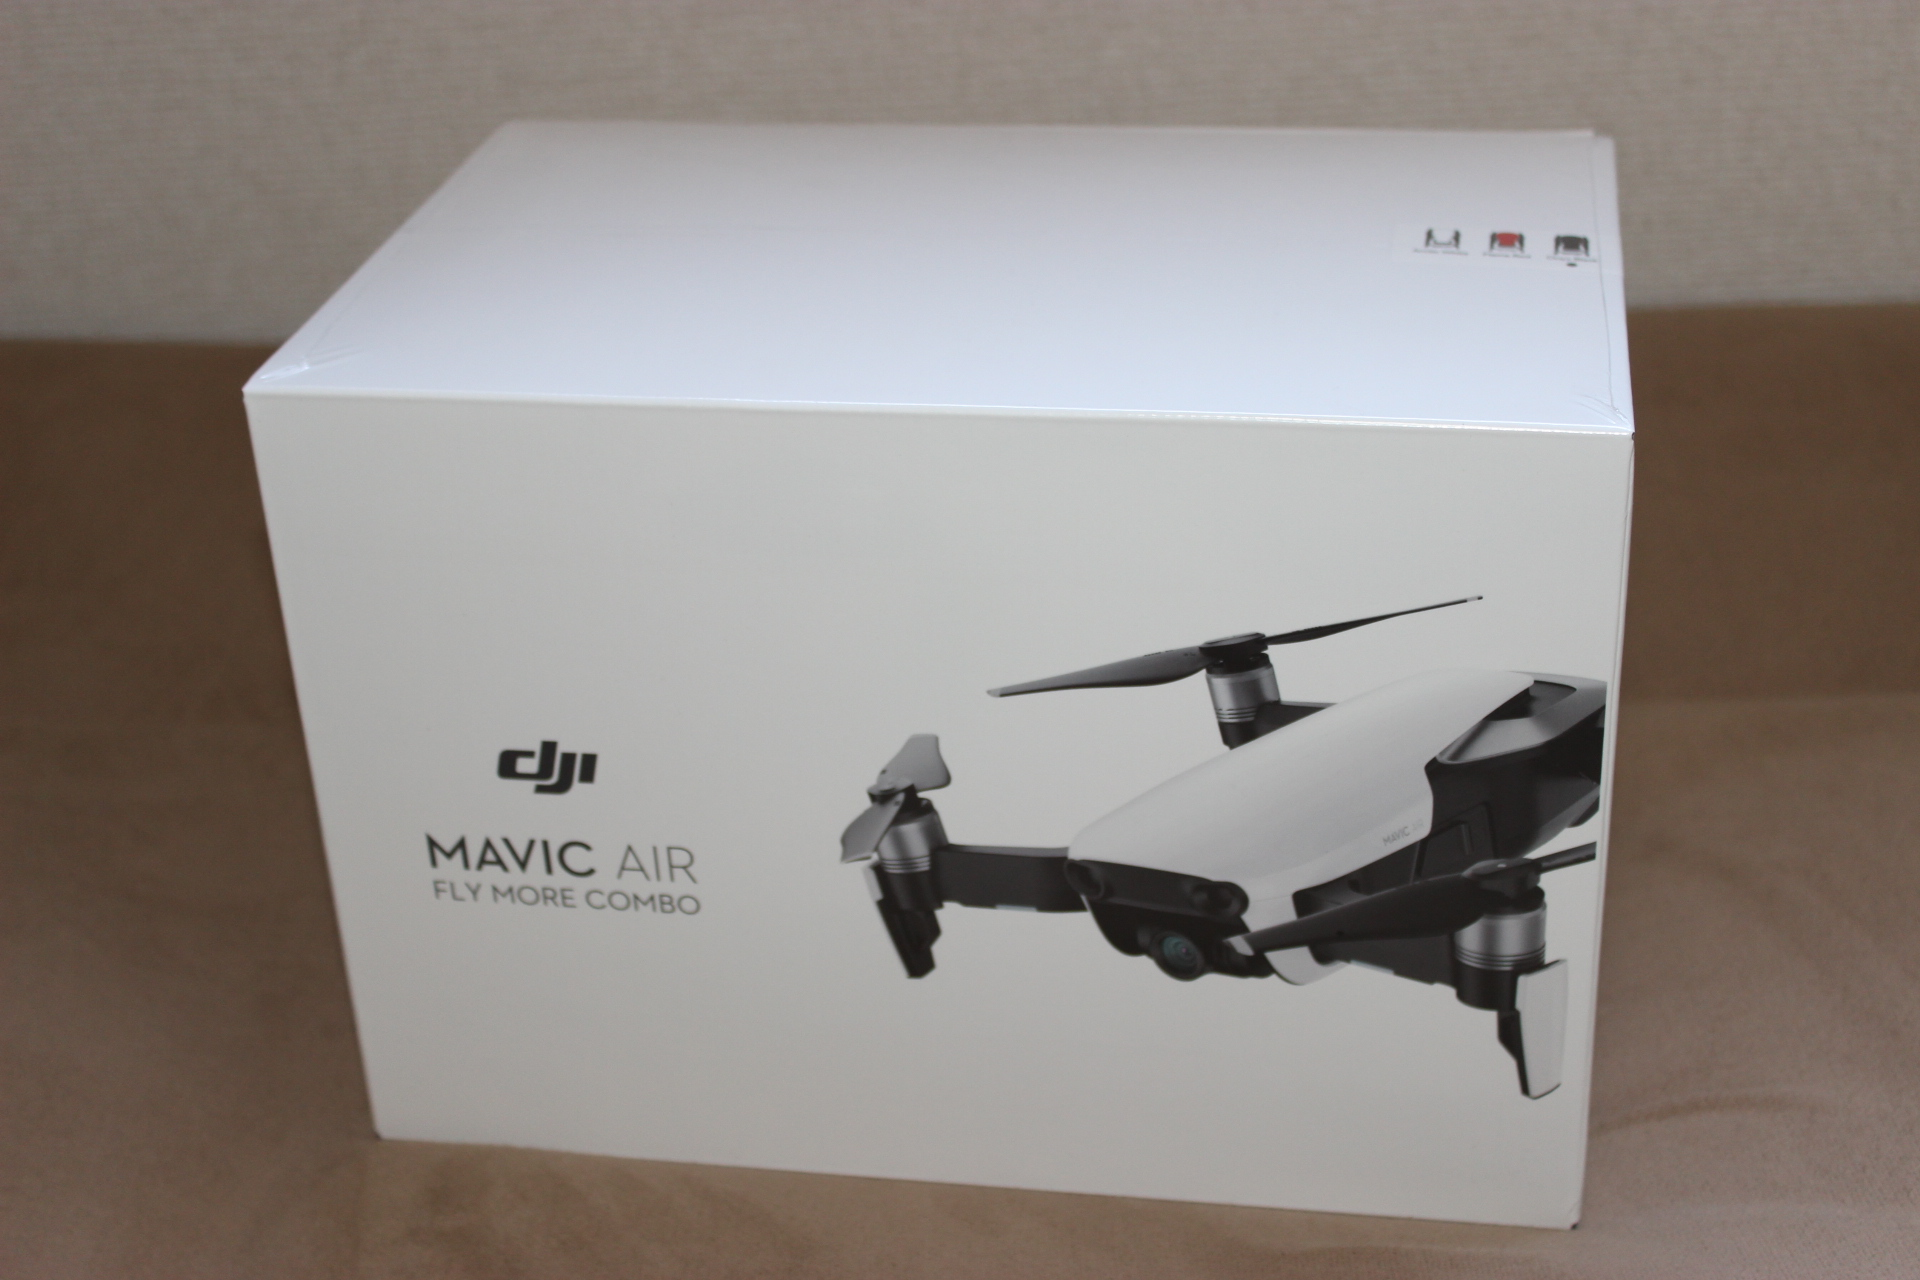 【 DJI Mavic Air 実機レビュー】マビックエアーは初心者におすすめの最強ドローンだぞ!!